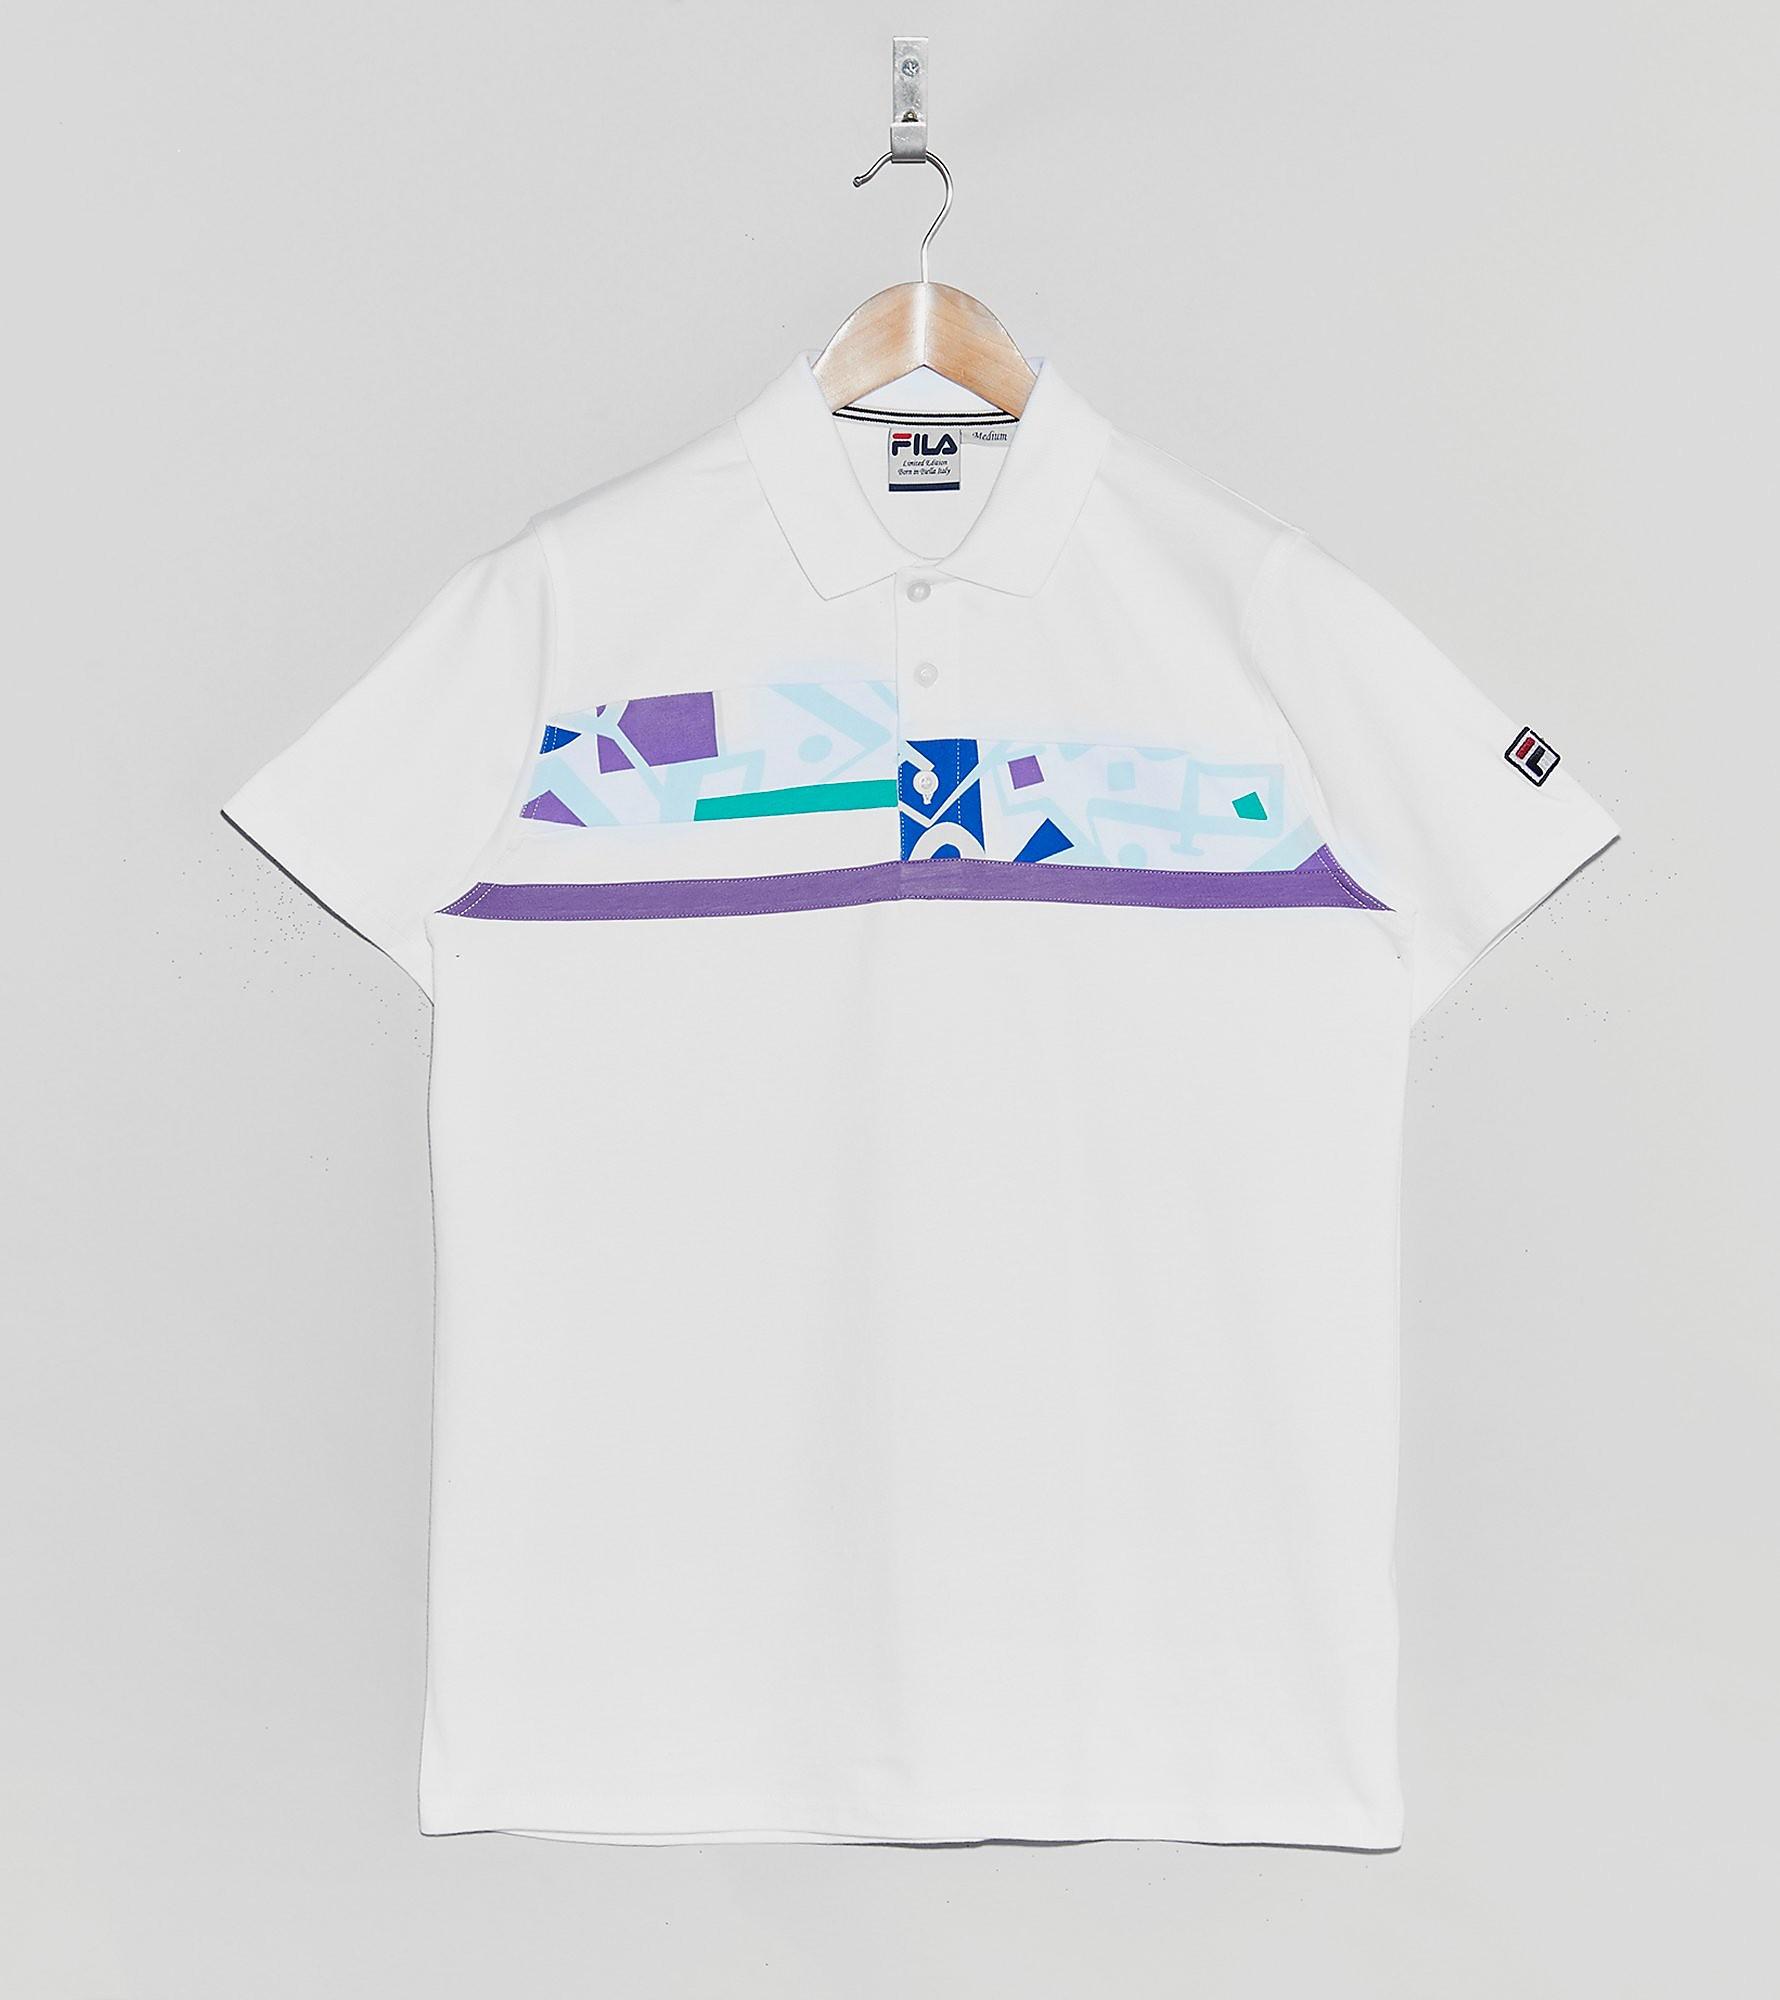 Fila Slam Polo Shirt - size? Exclusive